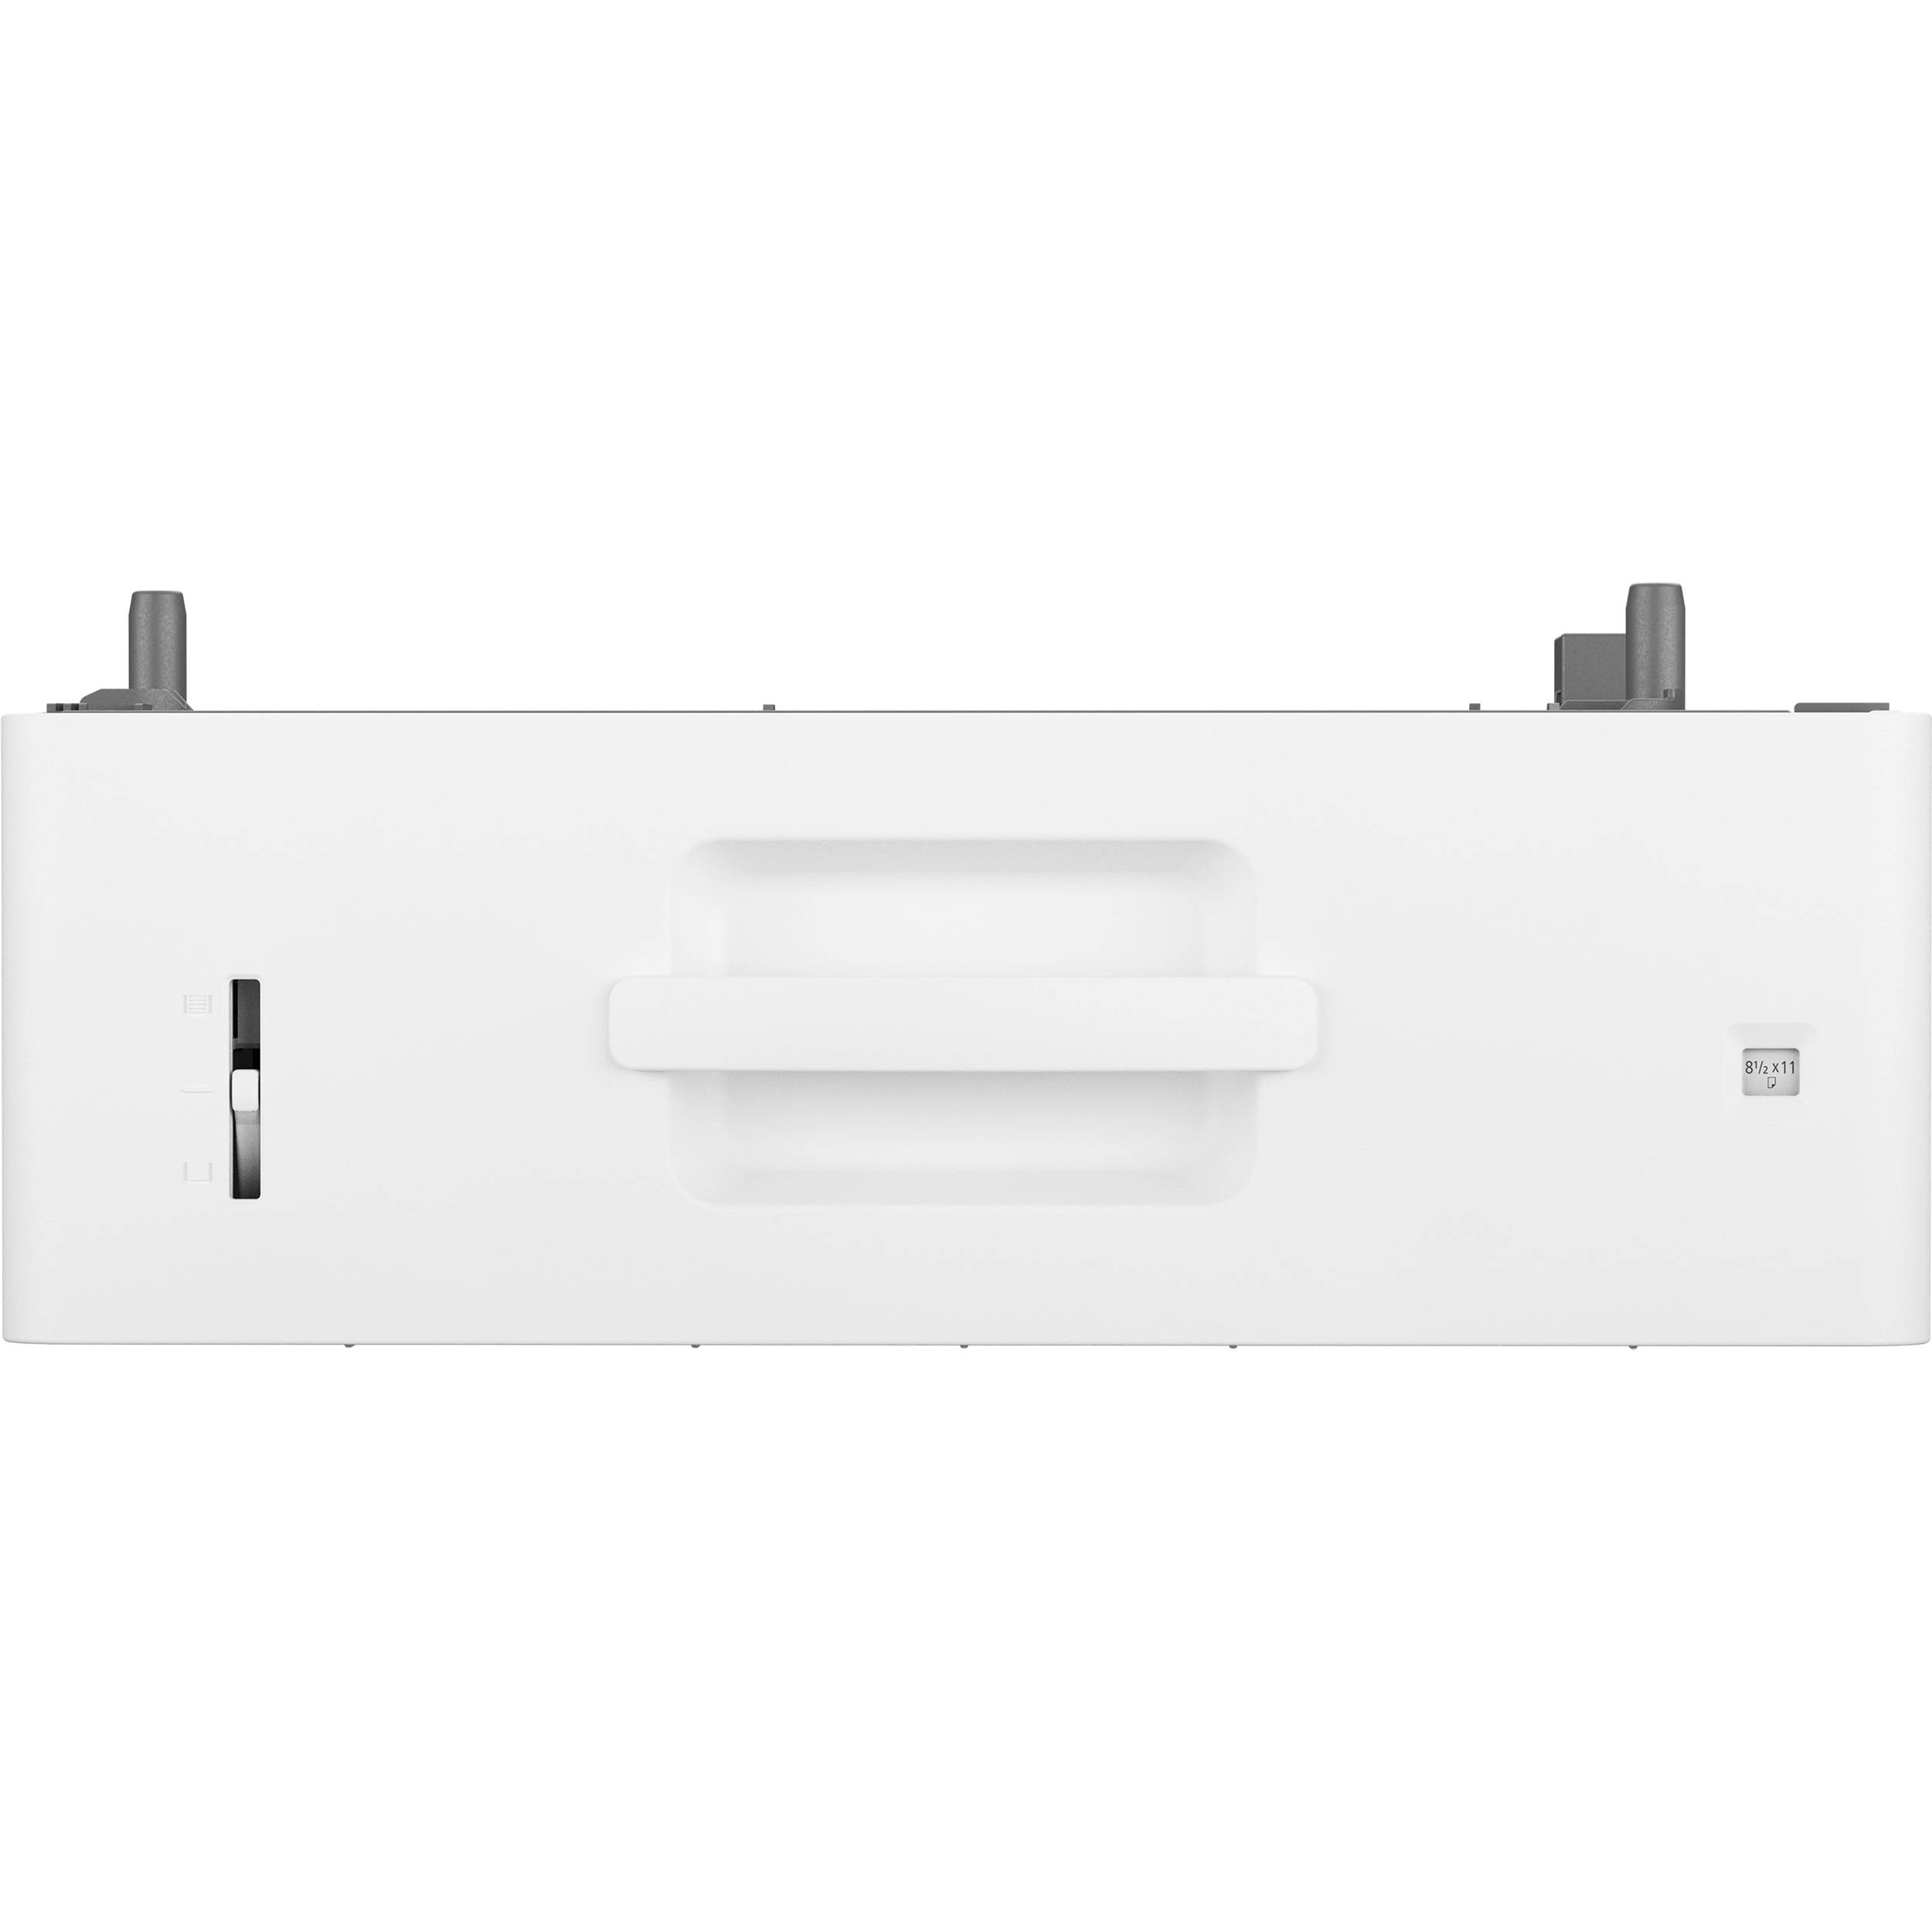 Ricoh 418081 500-Sheet Paper Feed Unit Type PB1120